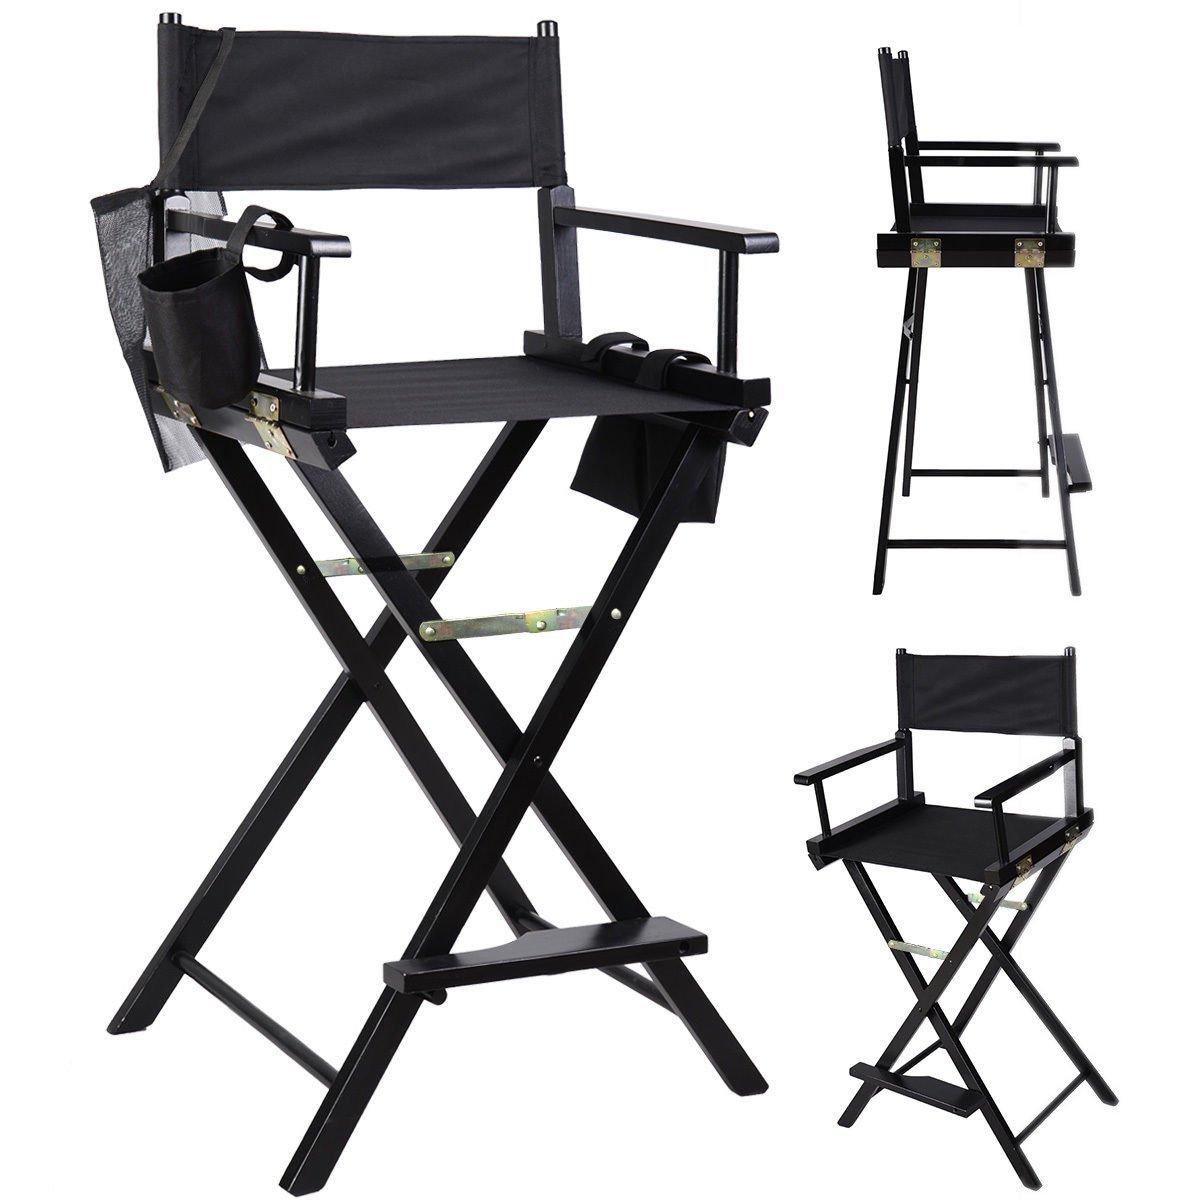 Professional Makeup Artist Directors Chair Wood Light Weight Foldabl.